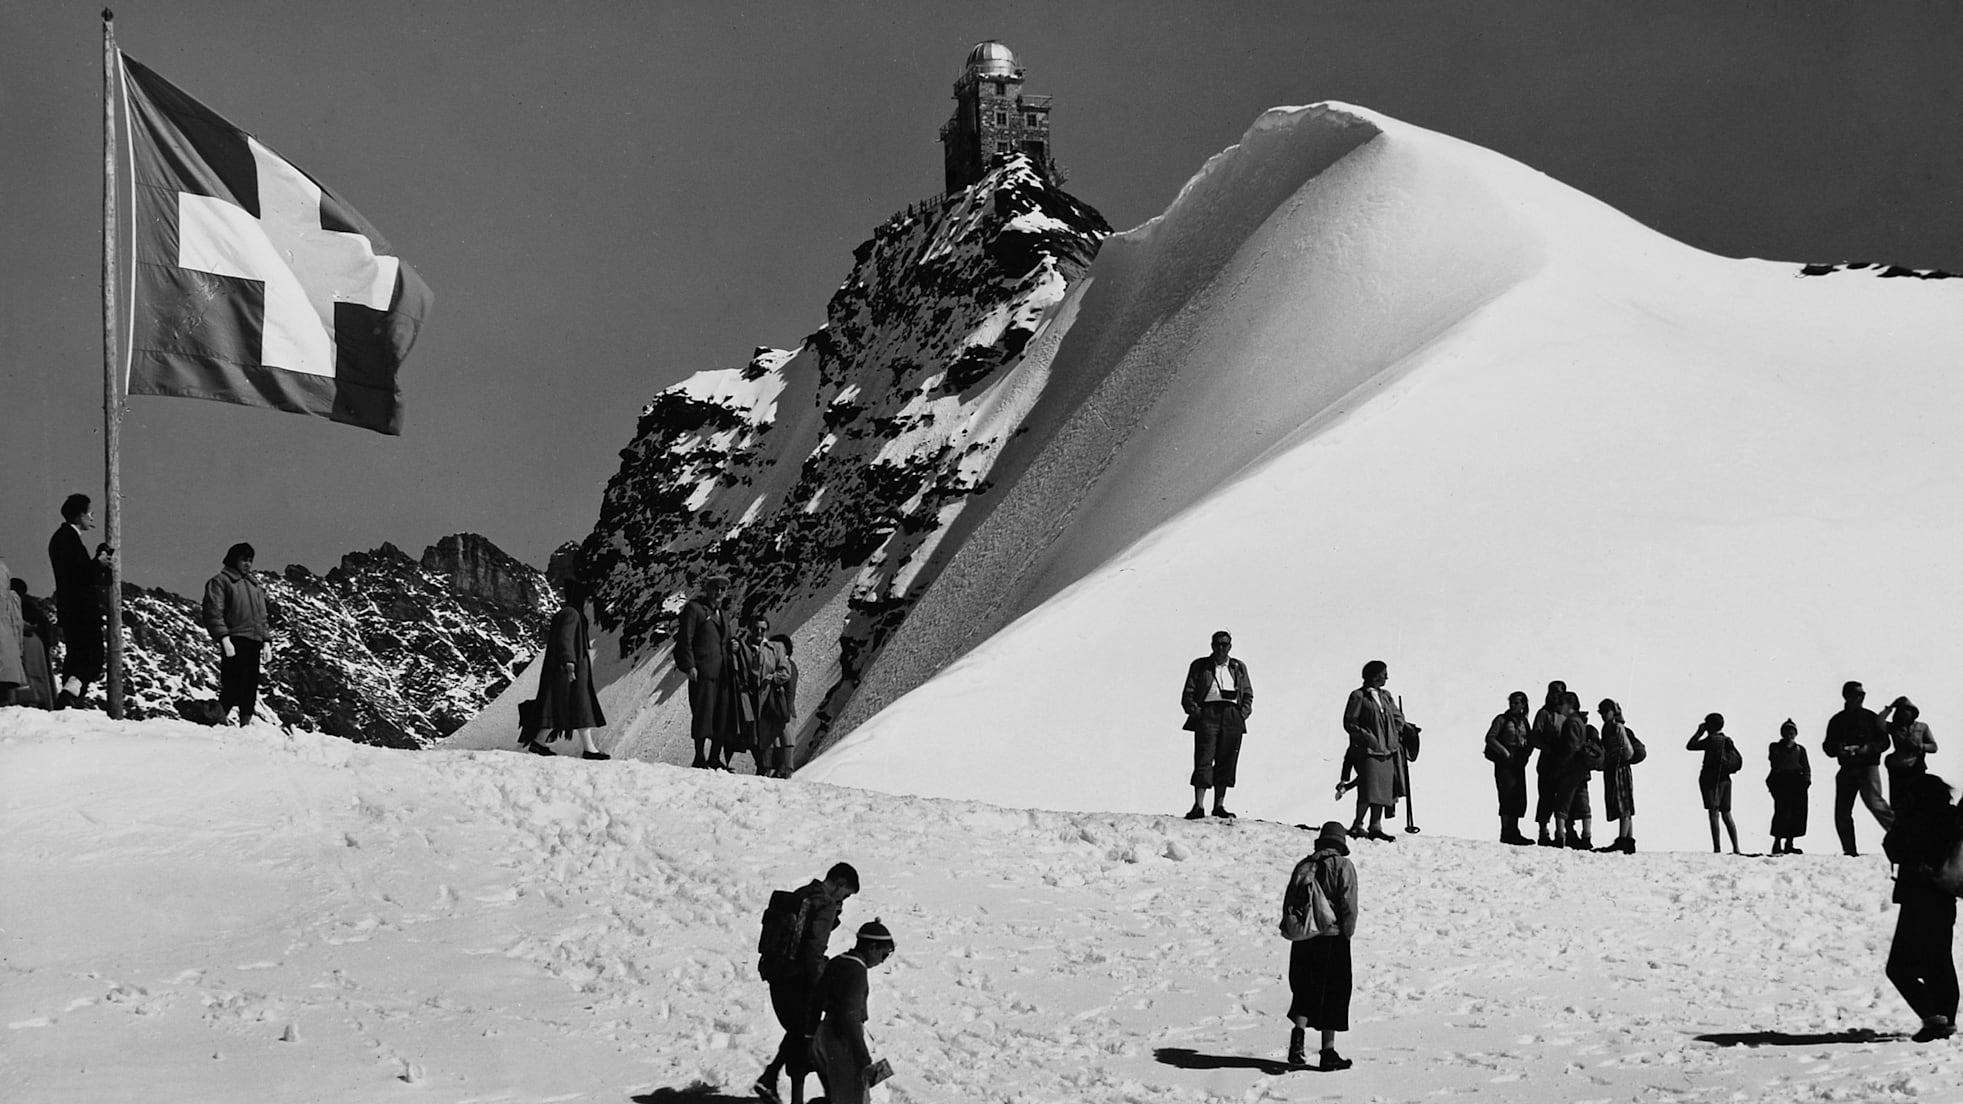 Jungfrau bahn nostalgie jungfraujoch plateau hinten sphinx